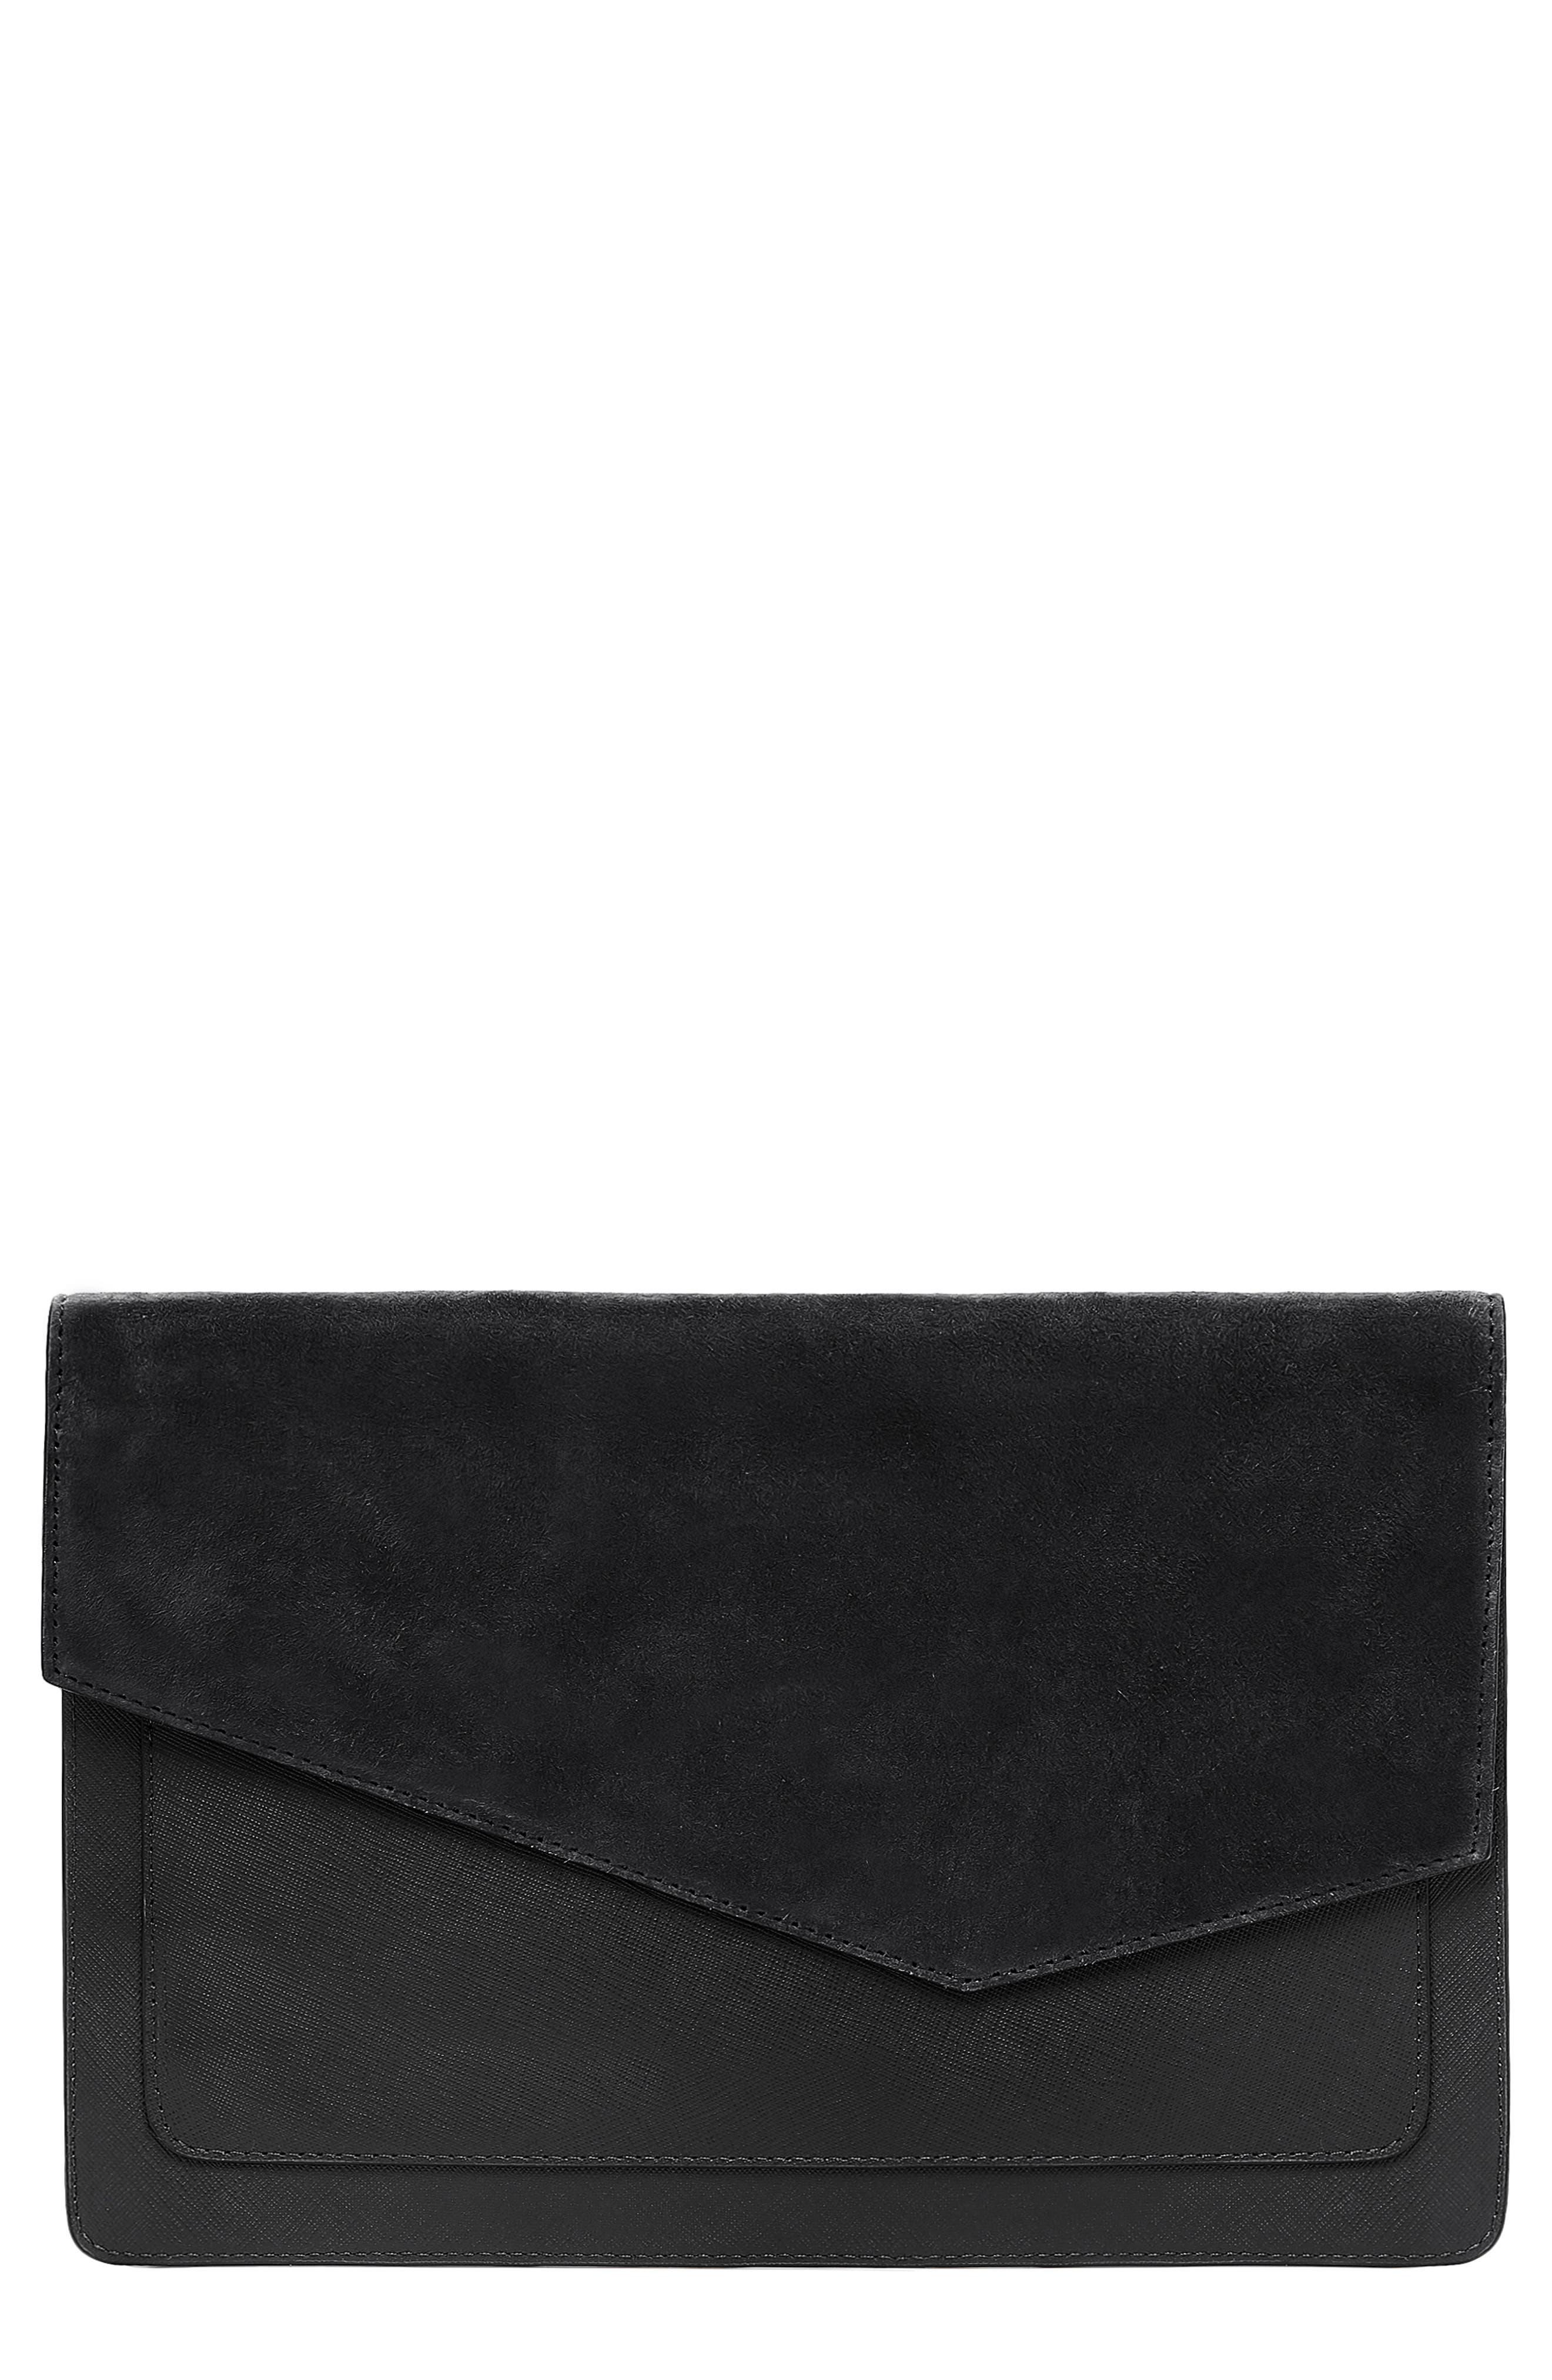 BOTKIER, Cobble Hill Calfskin Leather Flap Clutch, Main thumbnail 1, color, 001